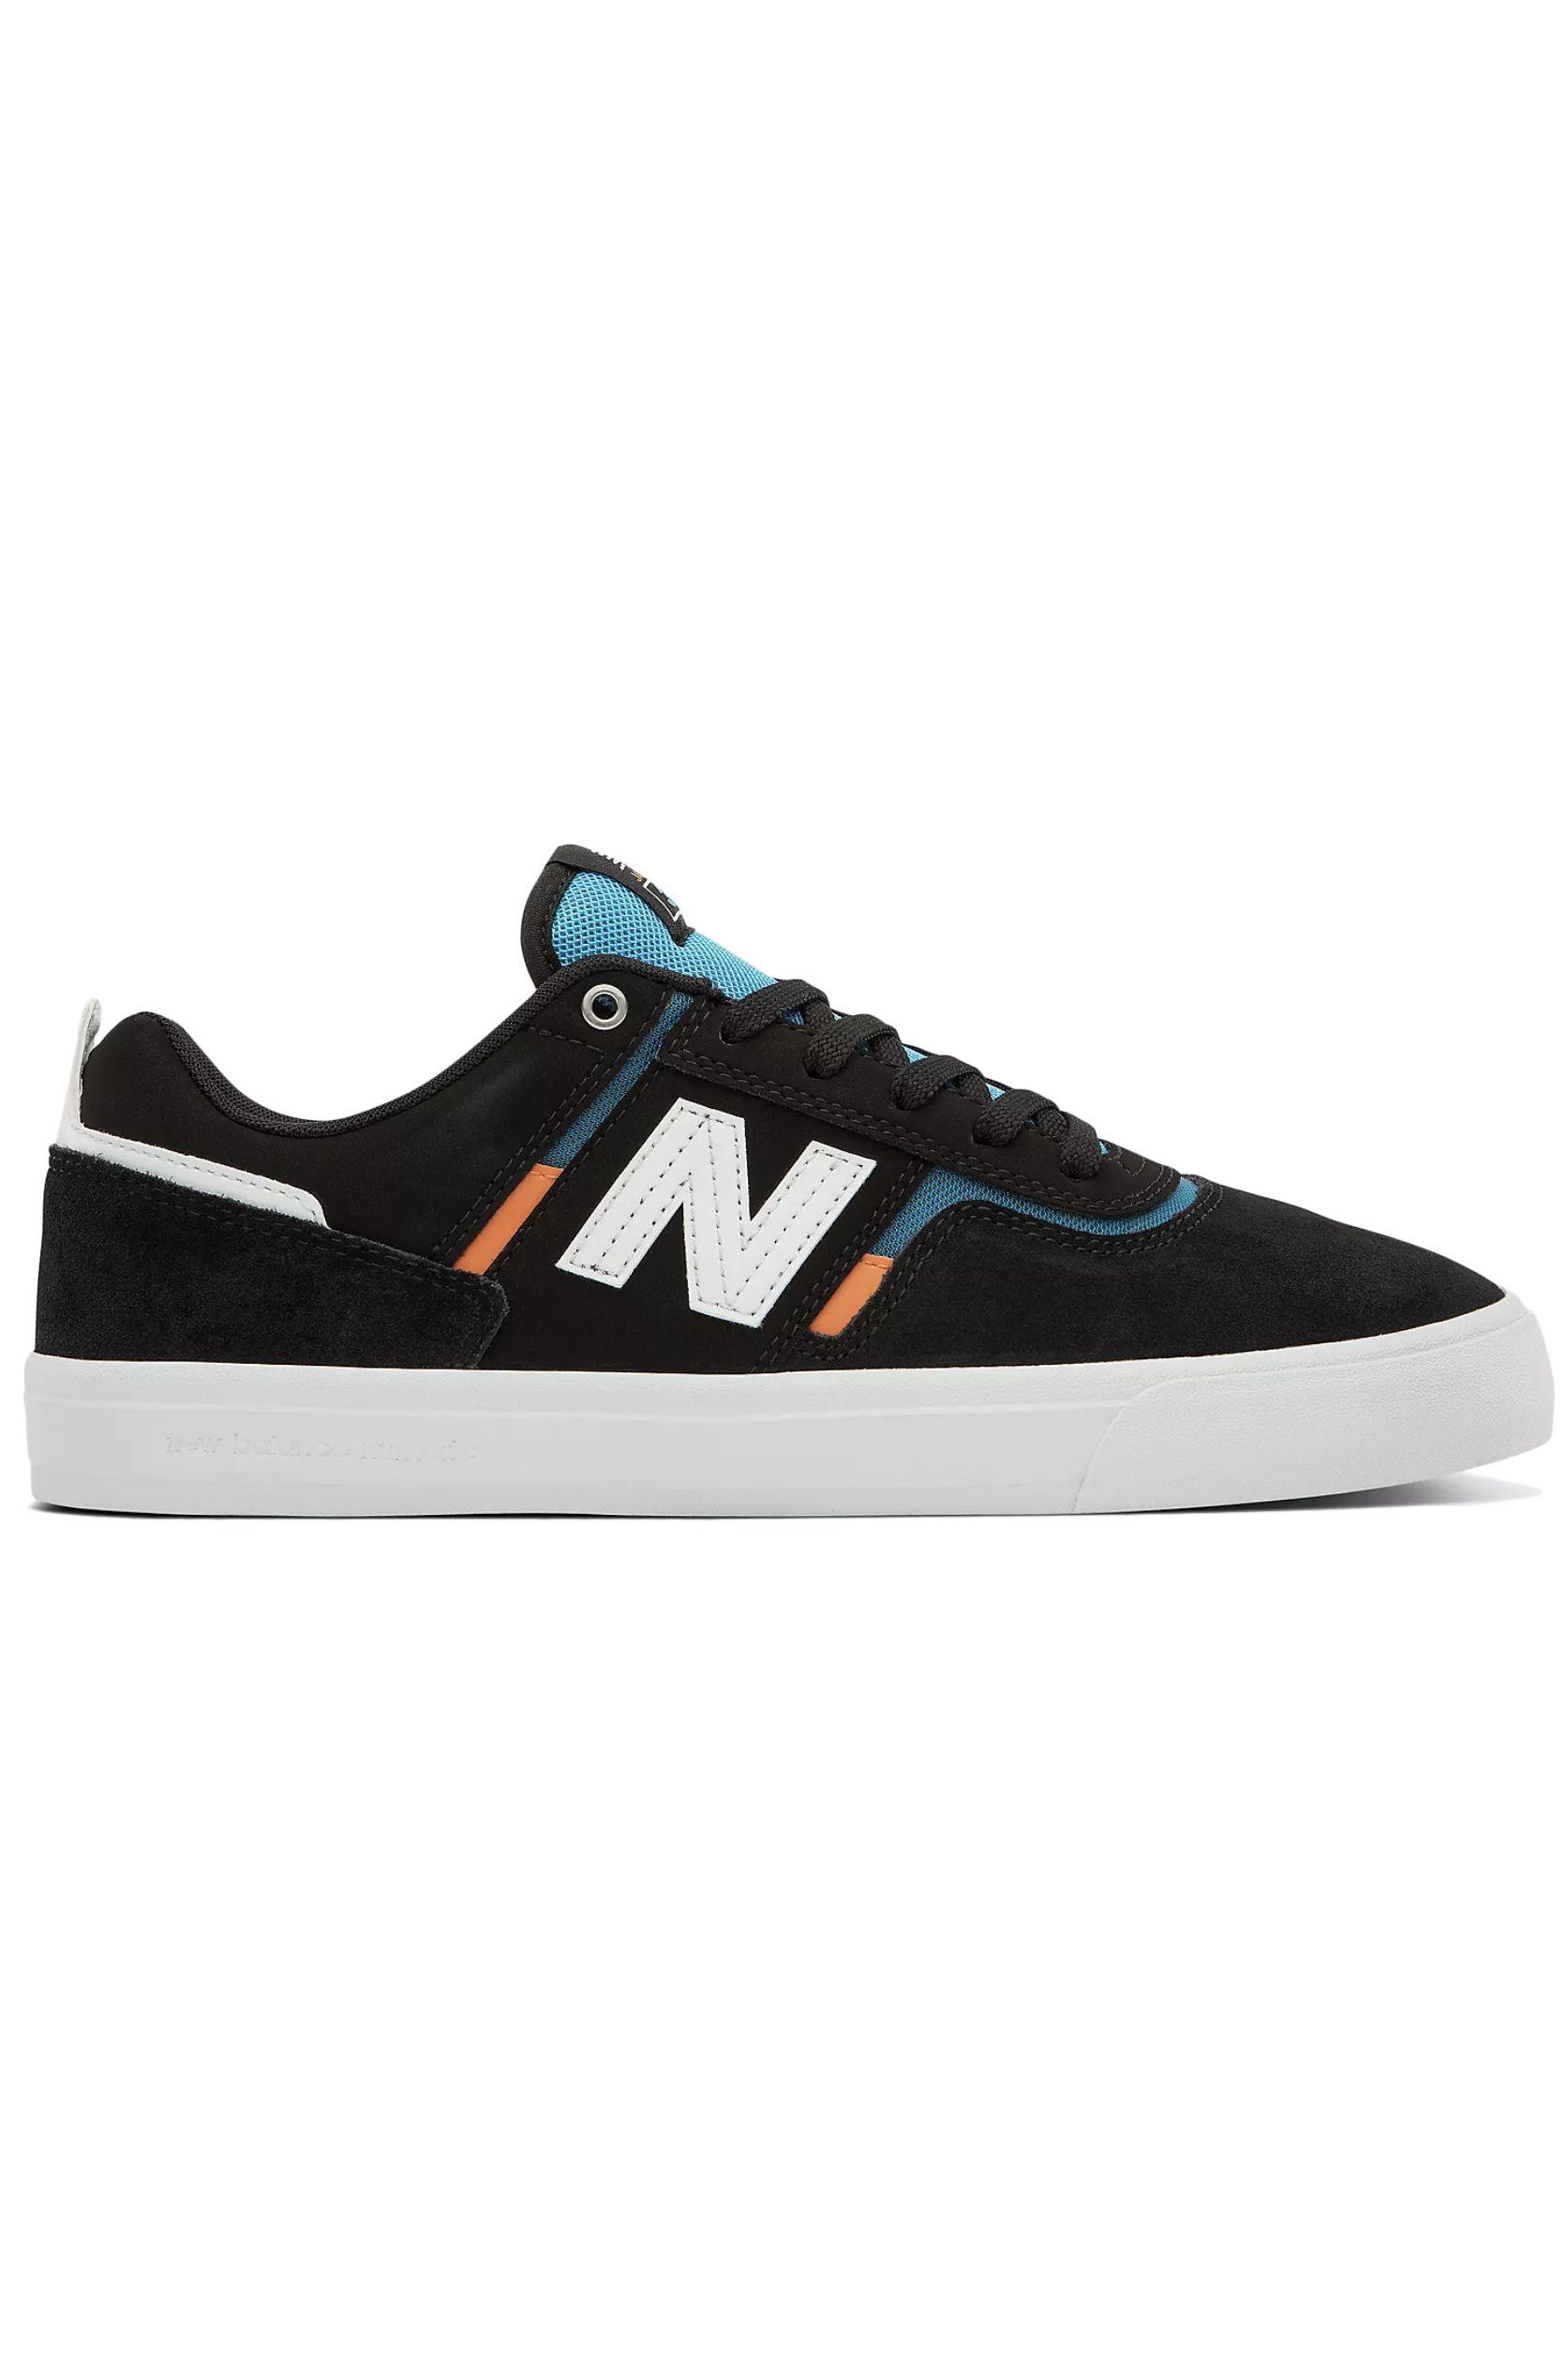 New Balance Shoes NM306 Black/Orange